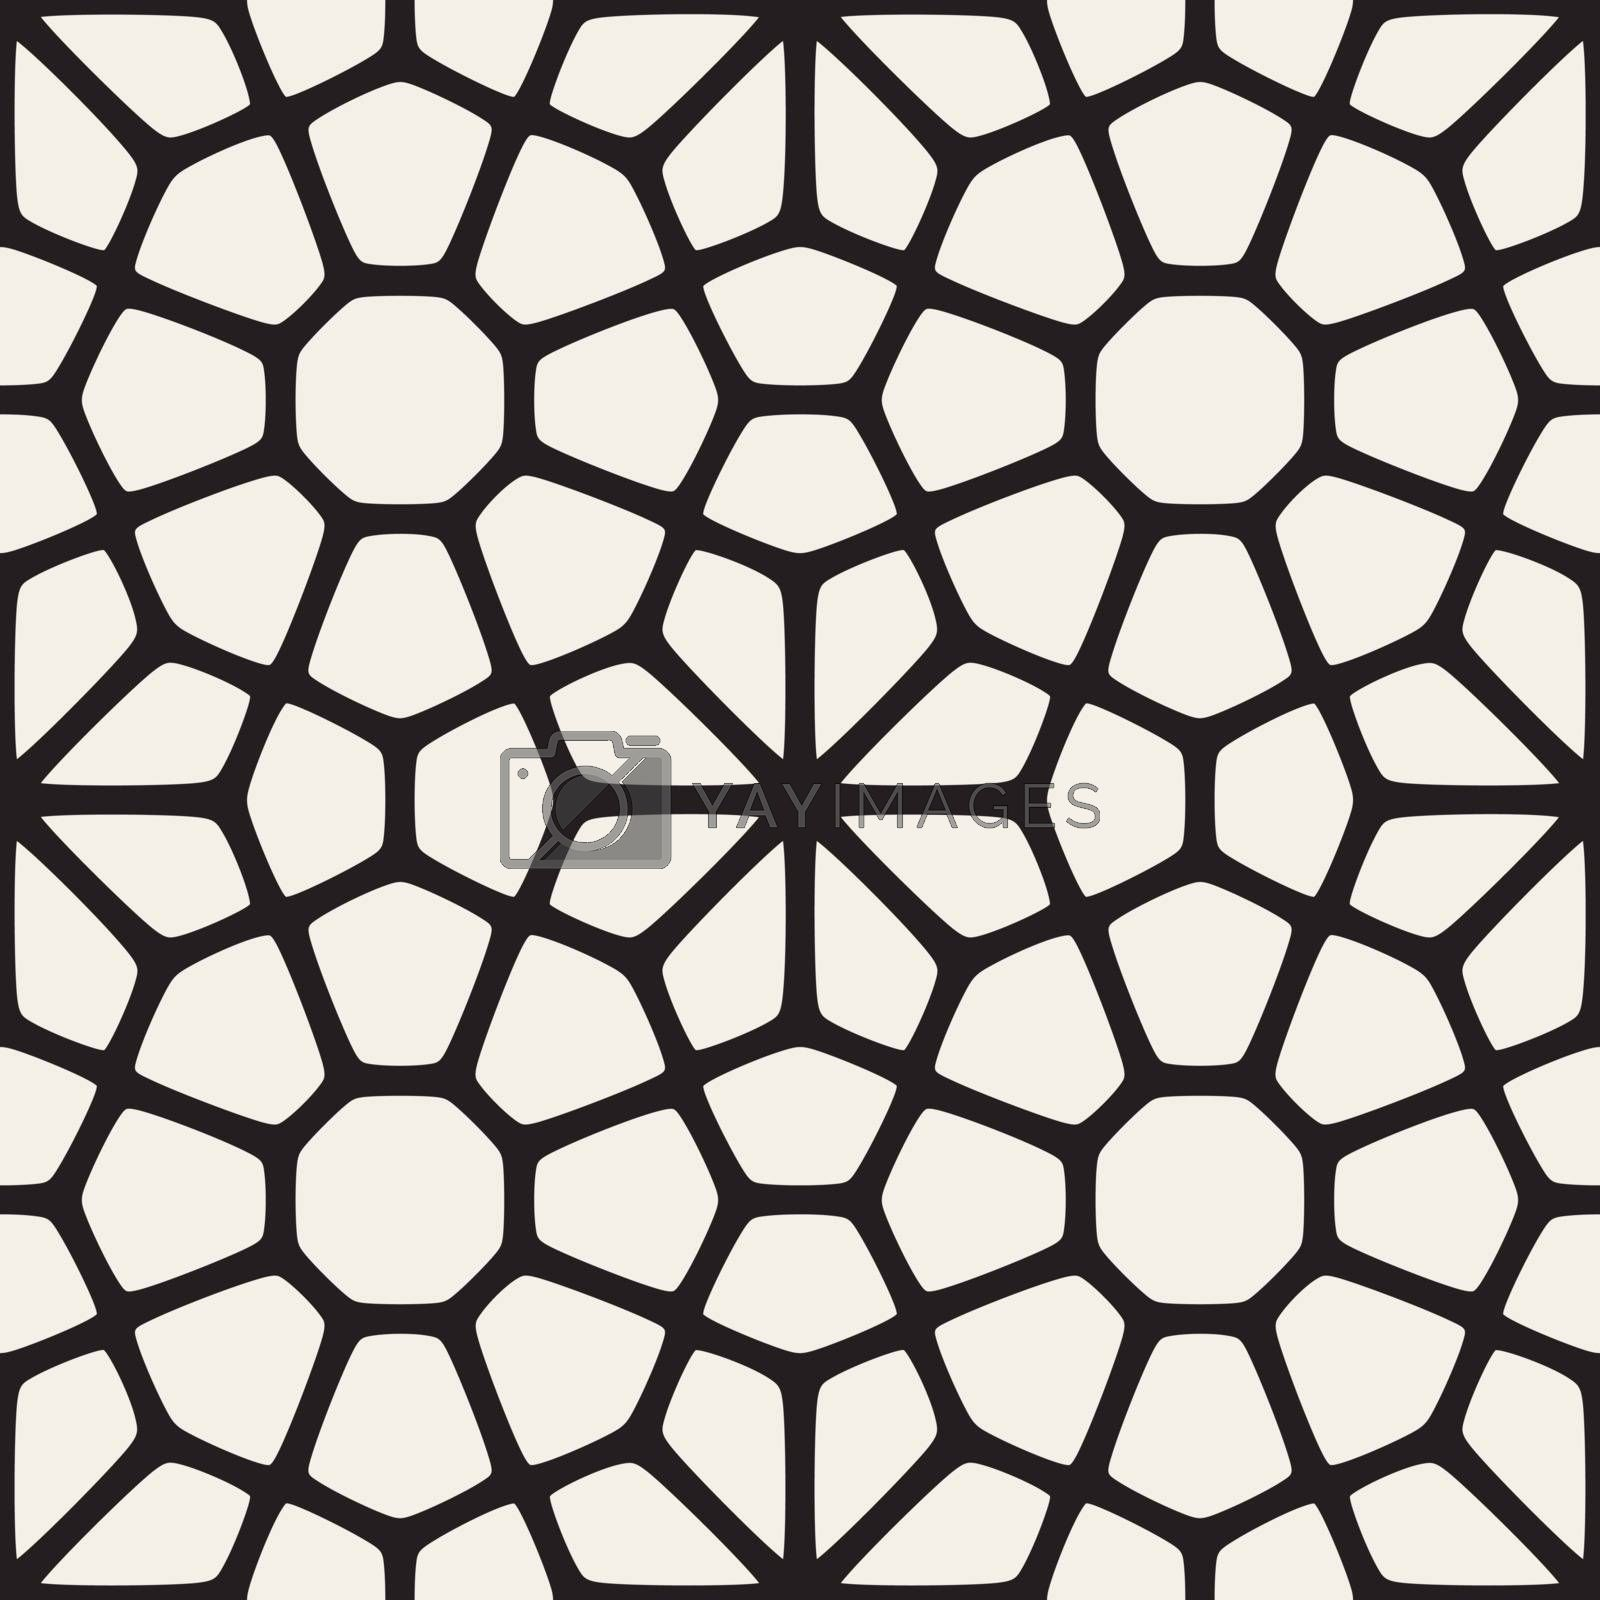 Vector Seamless Black and White Mosaic Lattice Pattern. Vector Seamless Black and White Pattern.